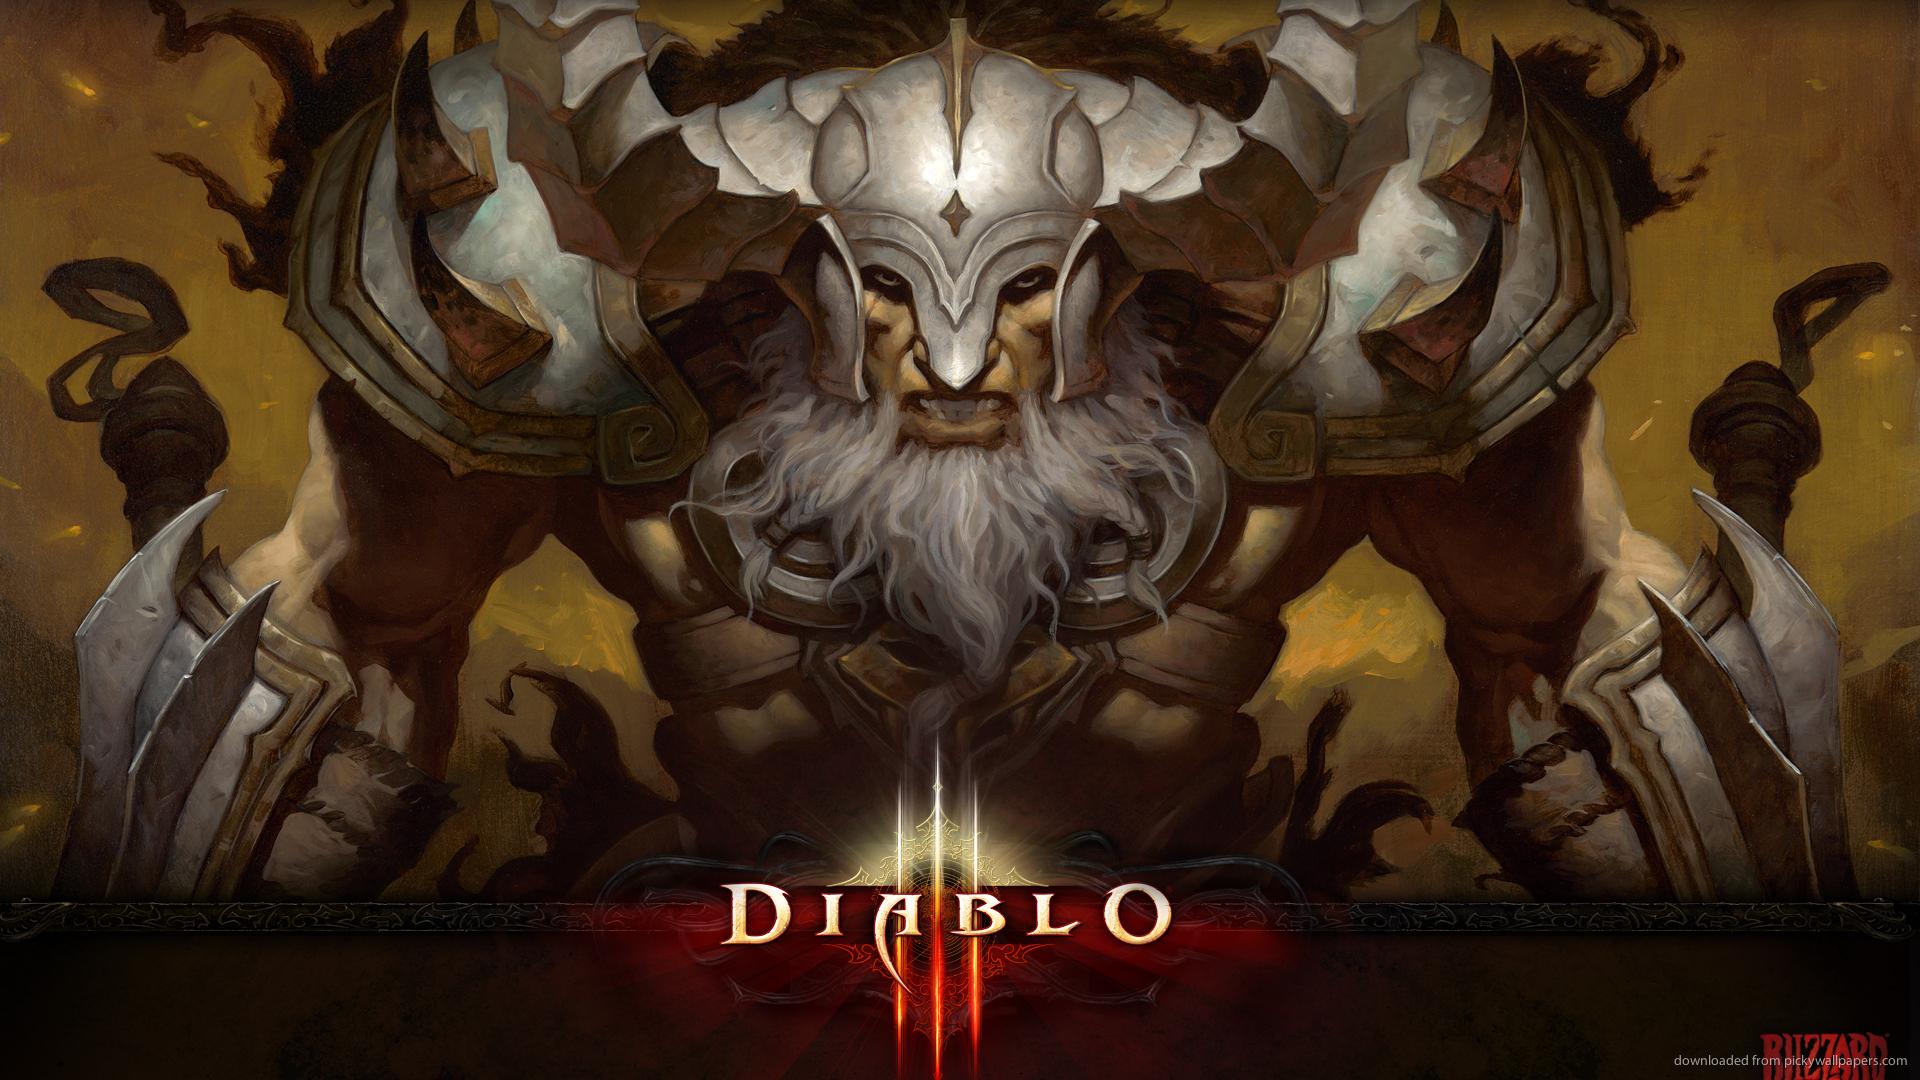 Download 1920x1080 Diablo 3 Unlocked Exclusive Barbarian Wallpaper 1920x1080